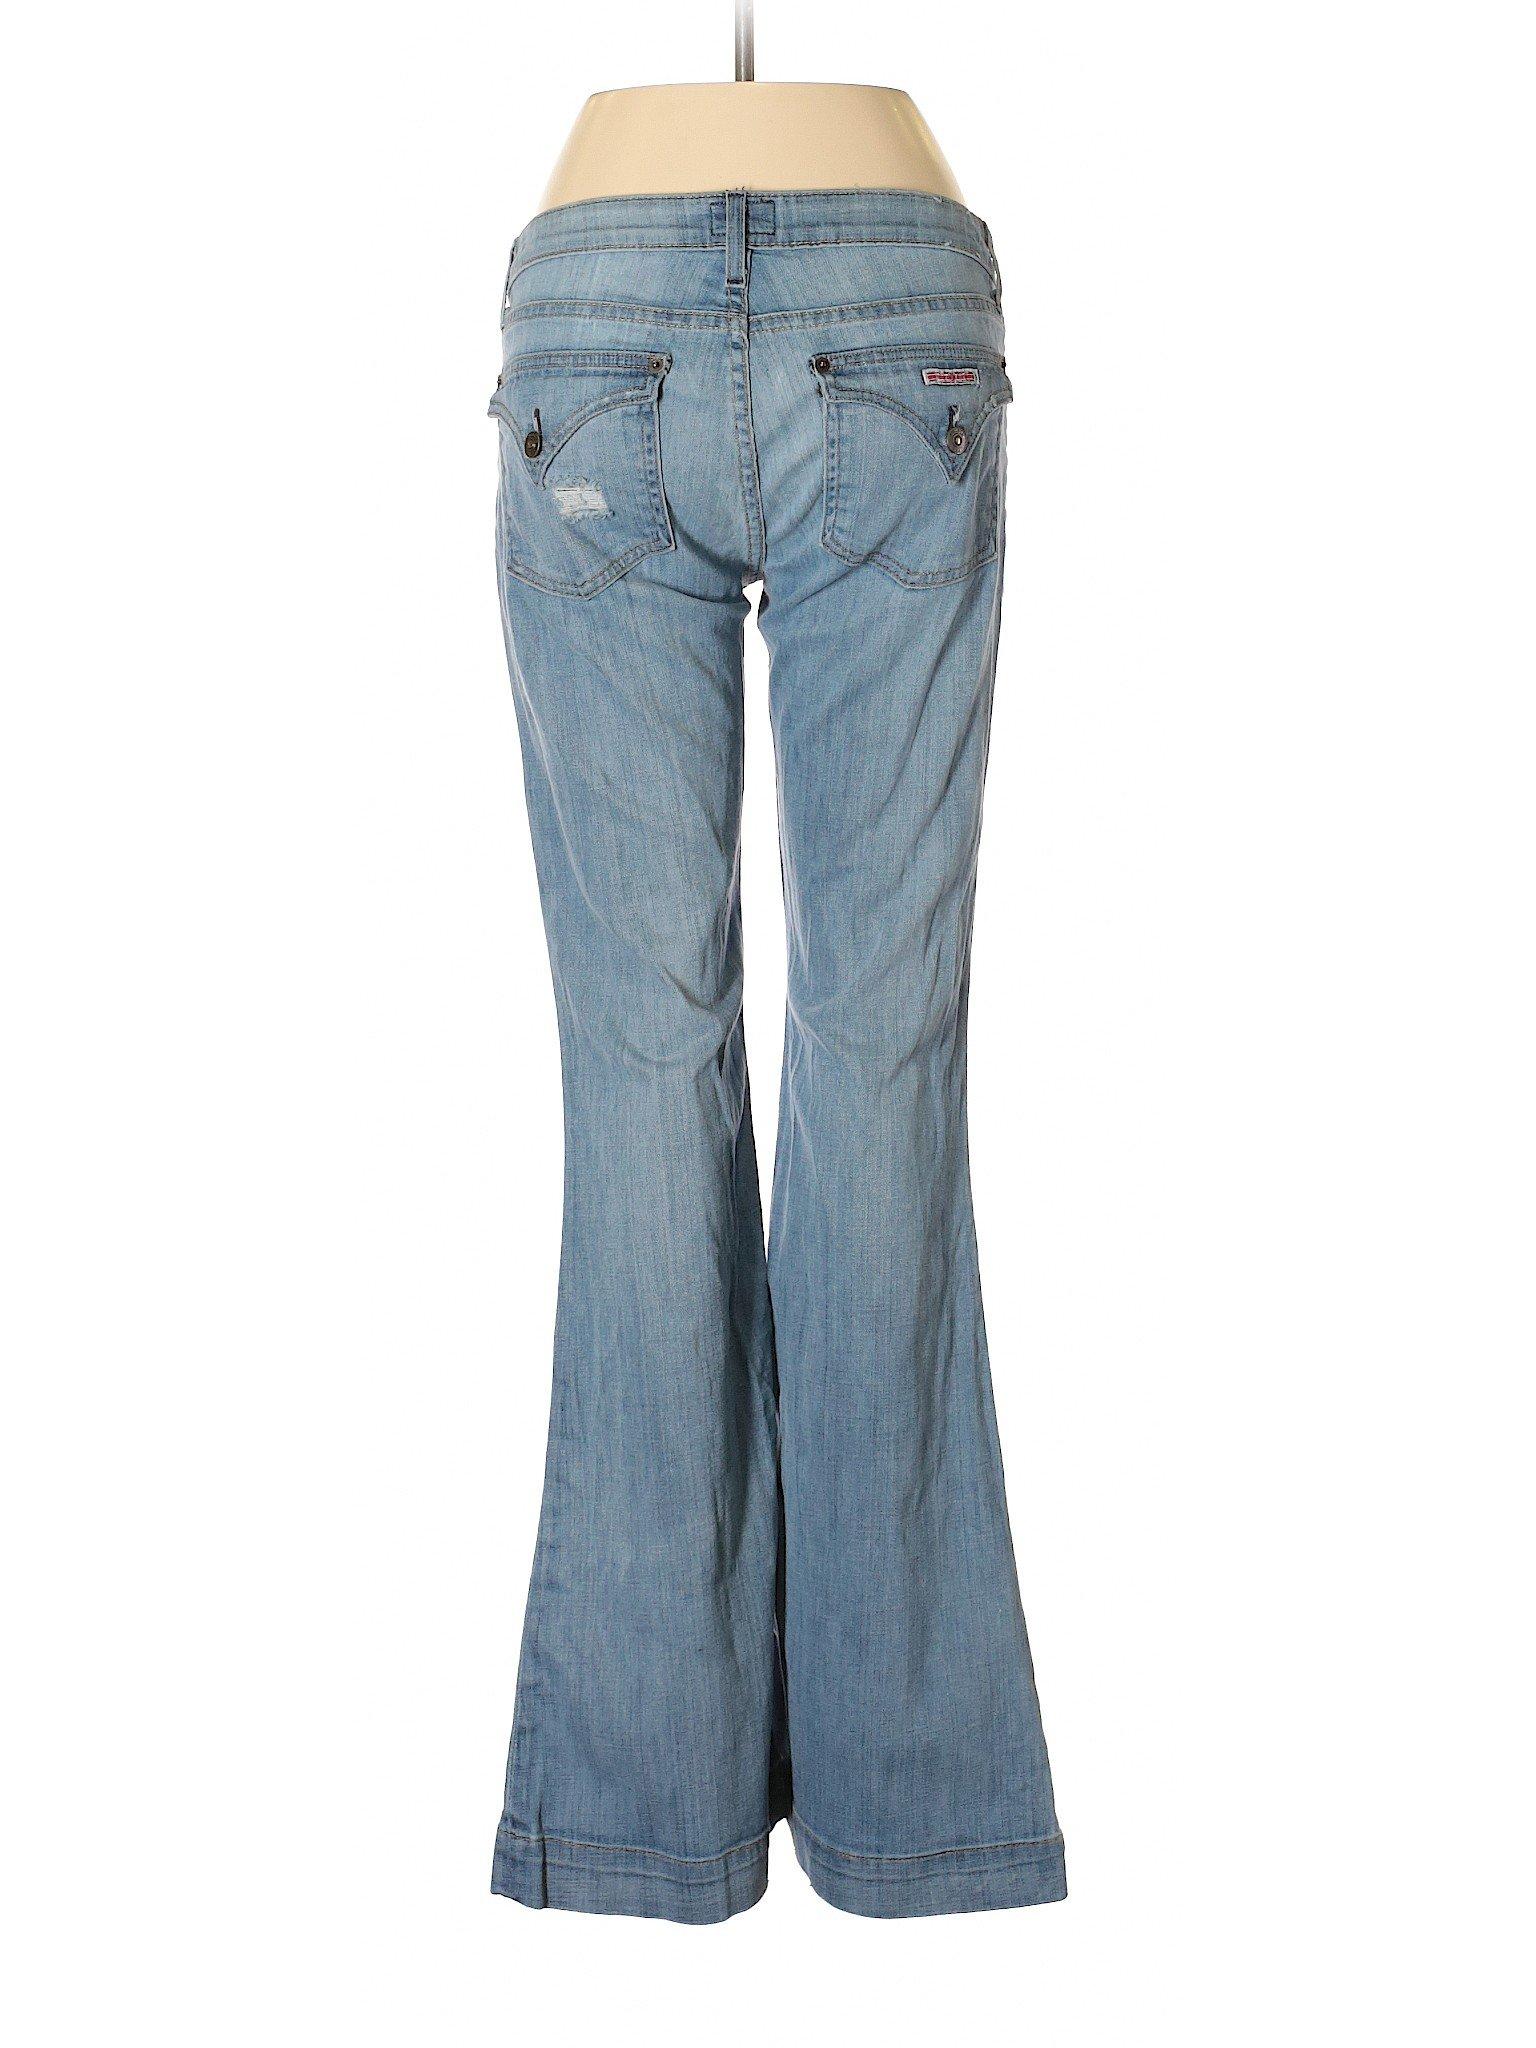 Jeans Promotion Promotion Jeans Hudson Hudson Hudson Promotion Jeans wxRx0qfrv